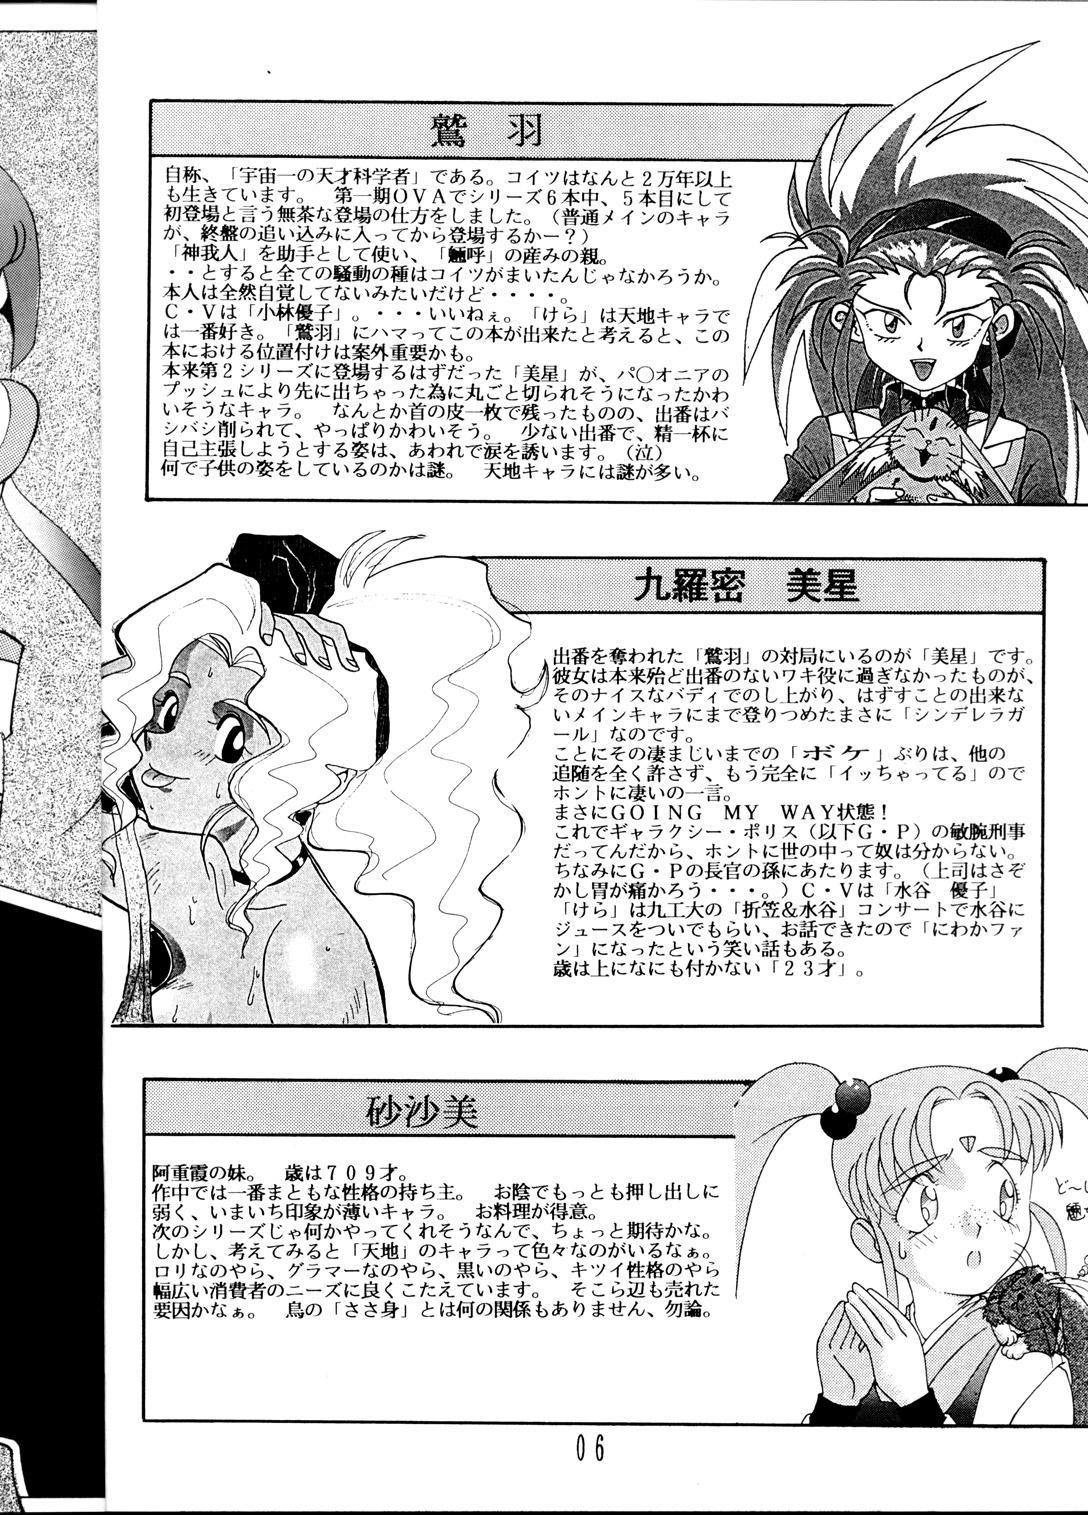 Tenchi Muyou! Sample Vol 6 4